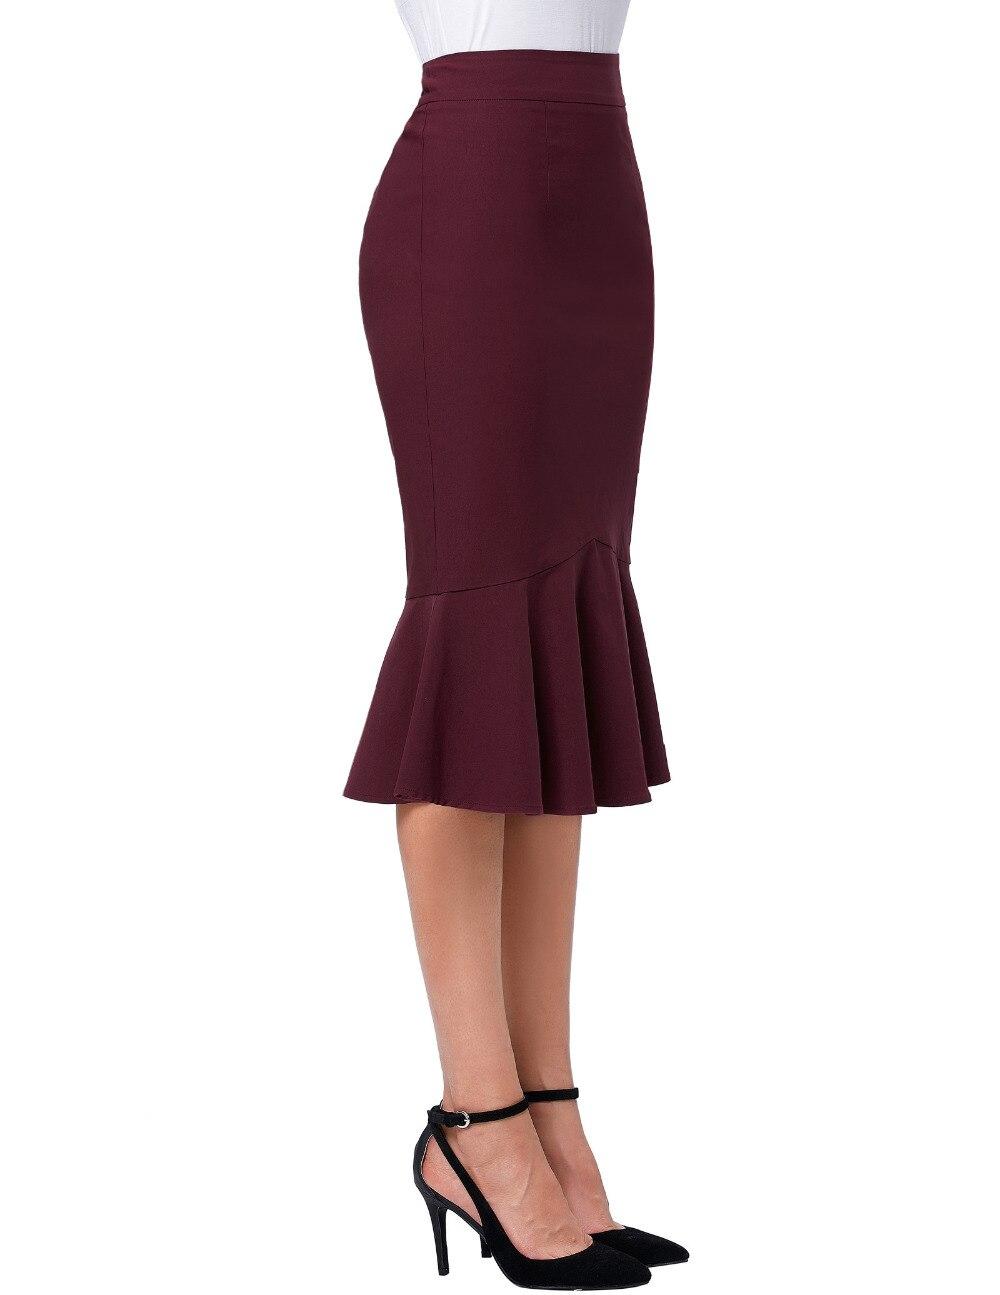 17 Skirts Faldas Women's Fashion OL Casual Mermaid Dark Wine Black Pencil Skirt Jupe Longue High Waist Sexy Long Skirt 2